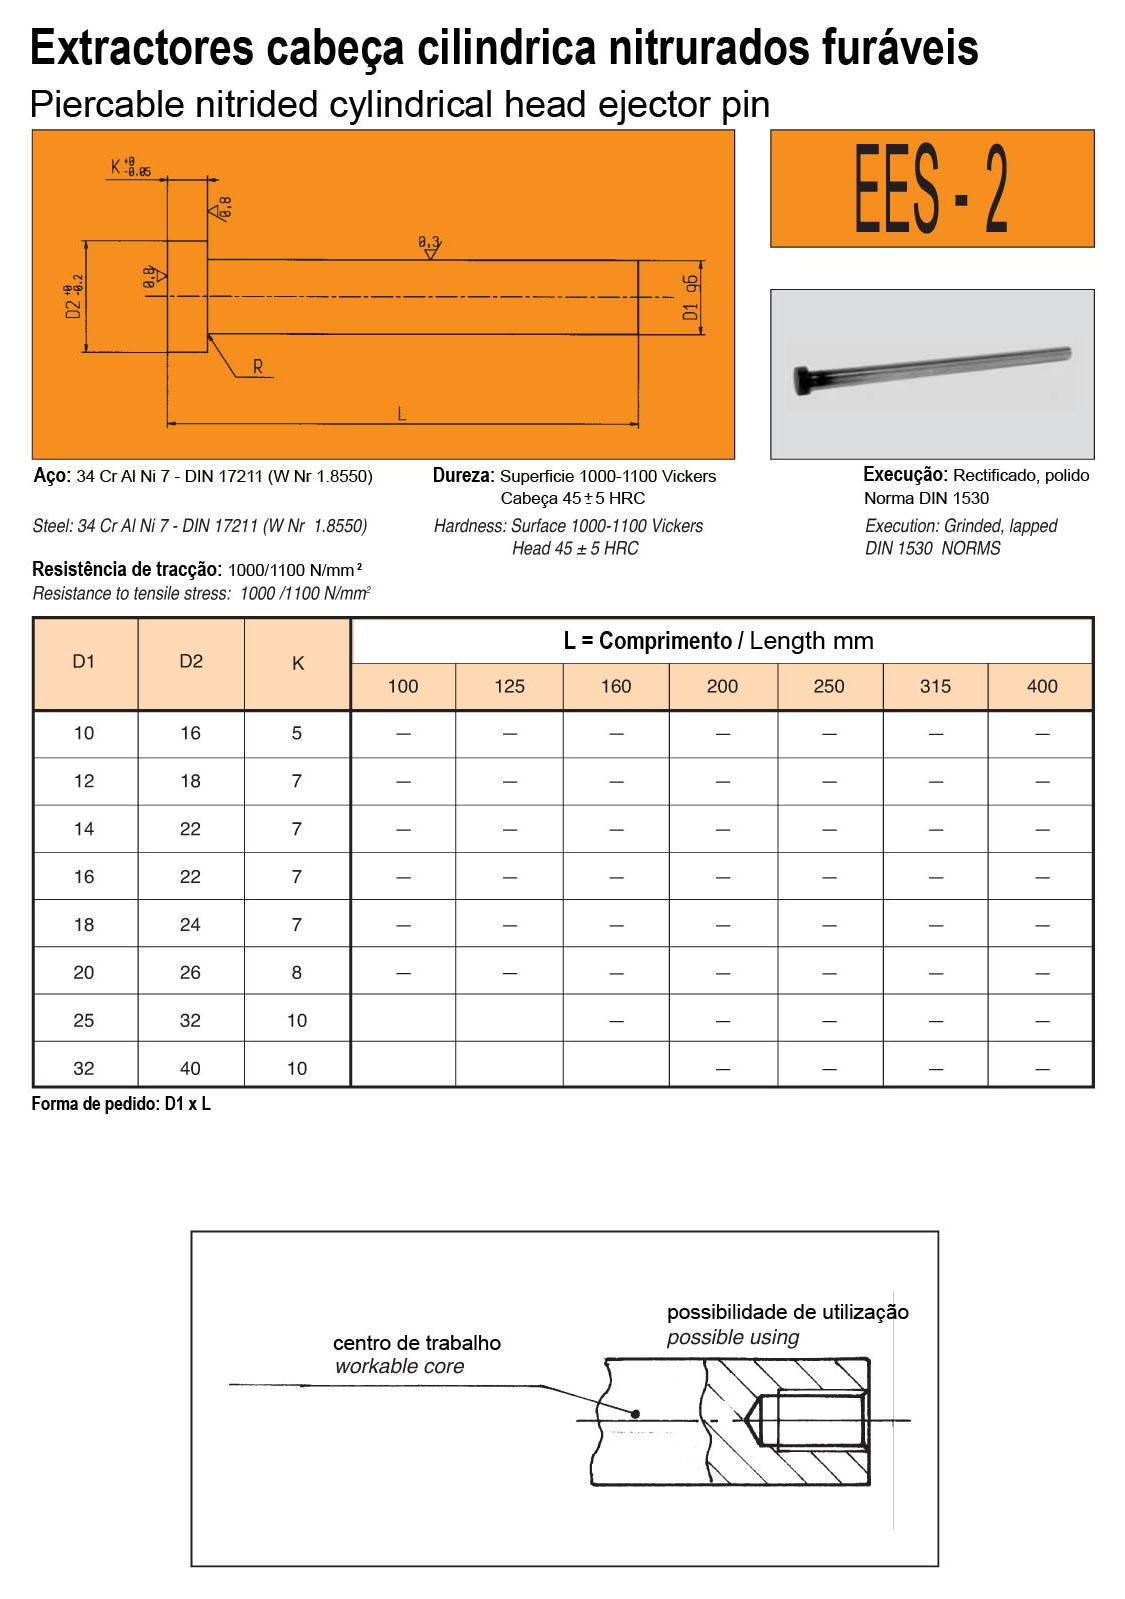 Extractores C/Cilindrica EES-2